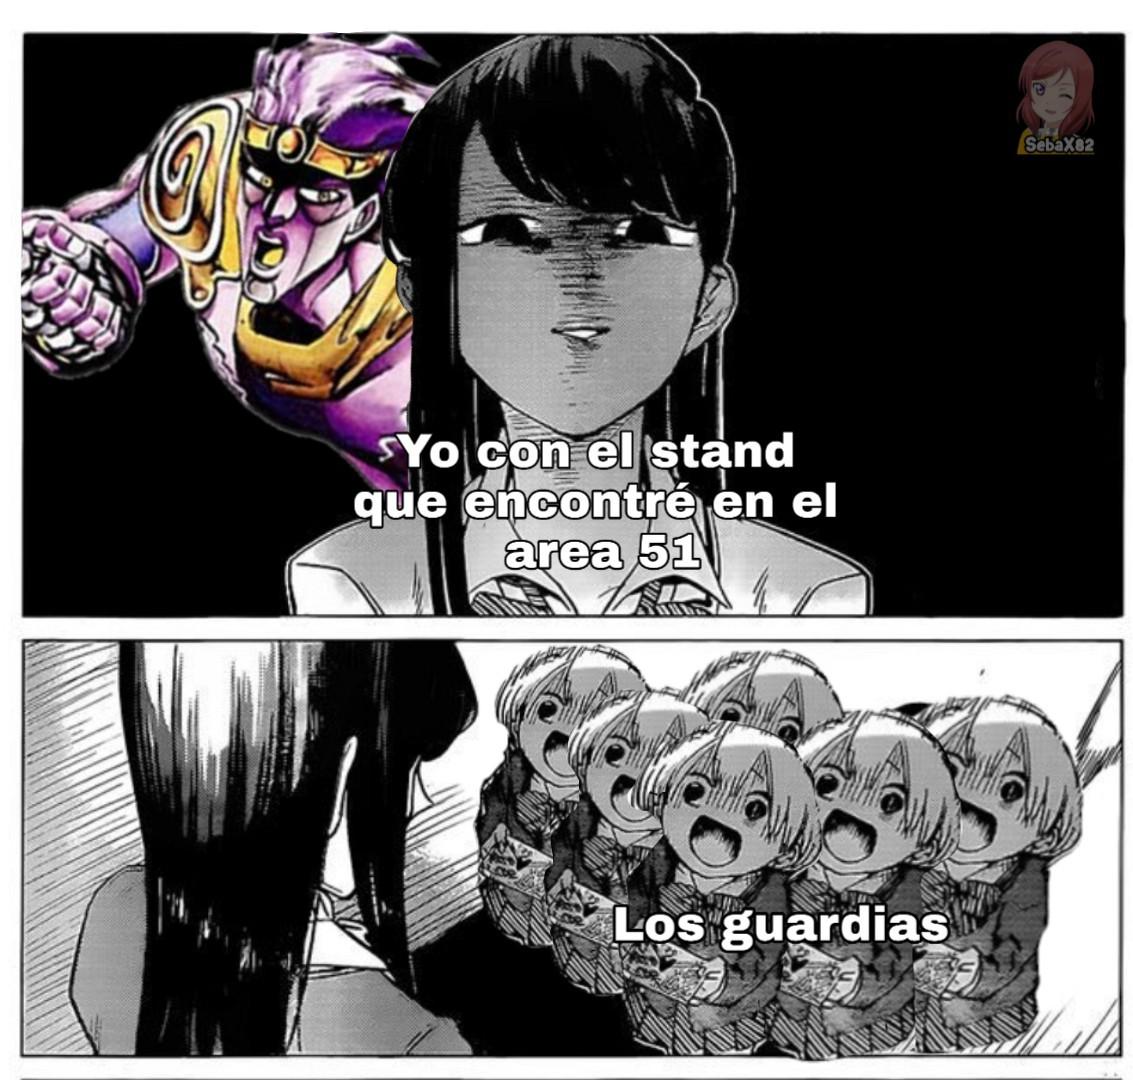 oraoraoraoraoraoraoraoraoraoraoraoraoraoraoraoraoraoraoraoraoraoraoraoraoraoraoraoraoraoraoraoraoraoraoraoraoraoraoraoraoraoraoraoraoraoraoraoraoraoraoraoraoraoraoraoraoraoraoraoraoraoraoraoraoraoraoraoraoraoraoraoraoraoraoraoraoraoraoraoraora - meme